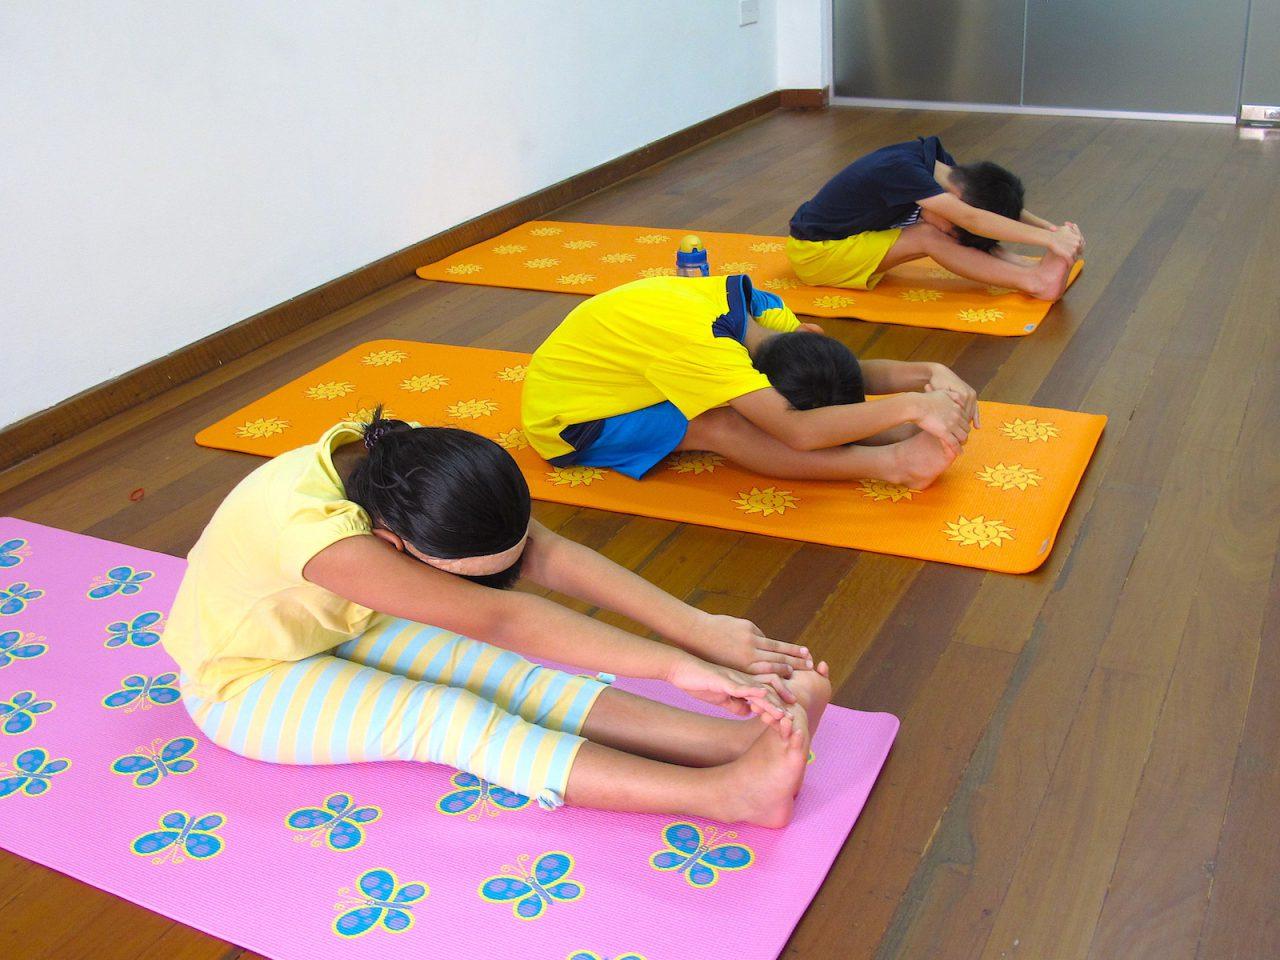 Kids-Yoga-Singapore-2-1280x960.jpg